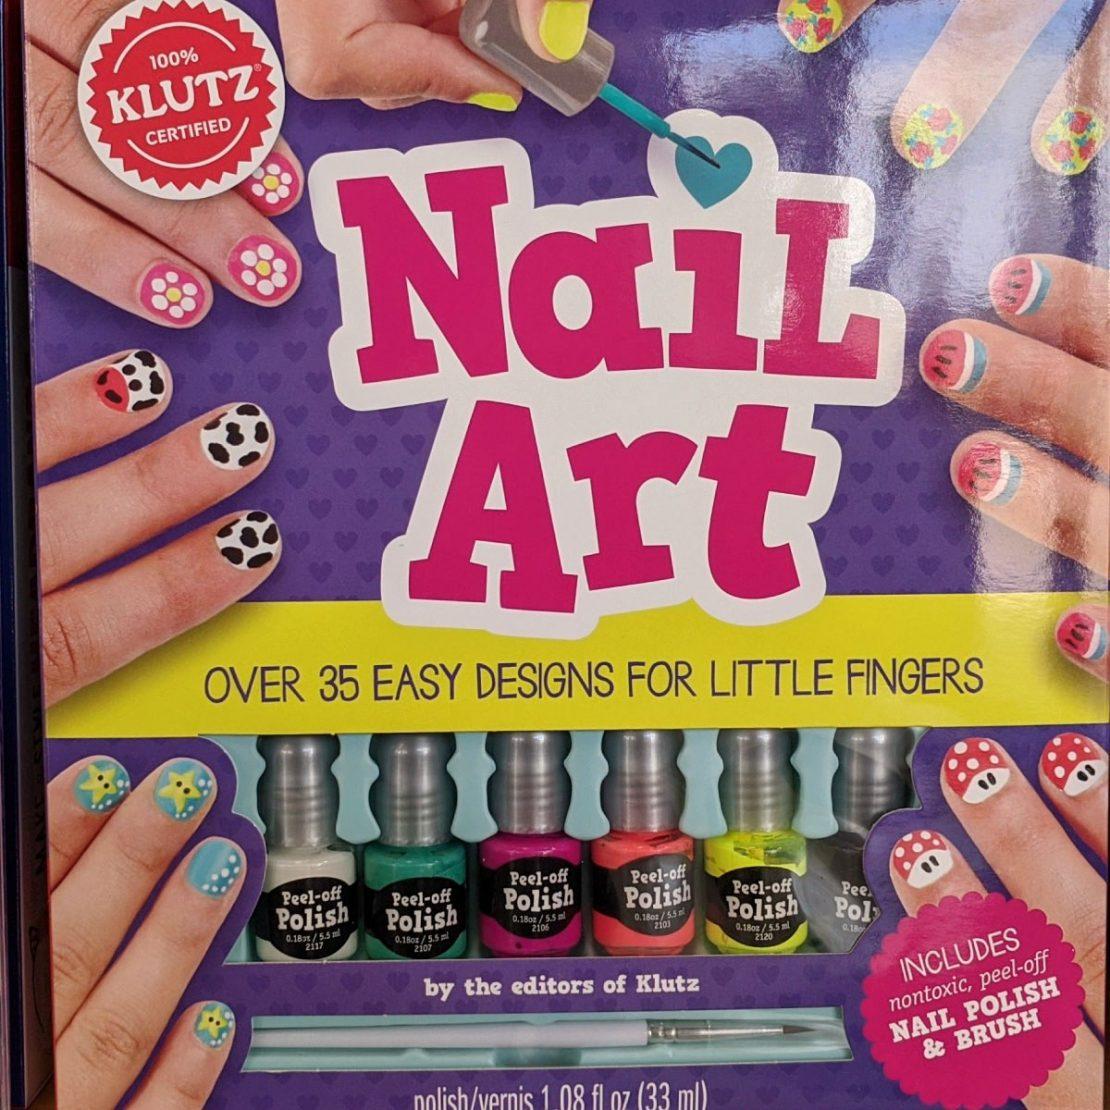 Nail Art Kit from Klutz